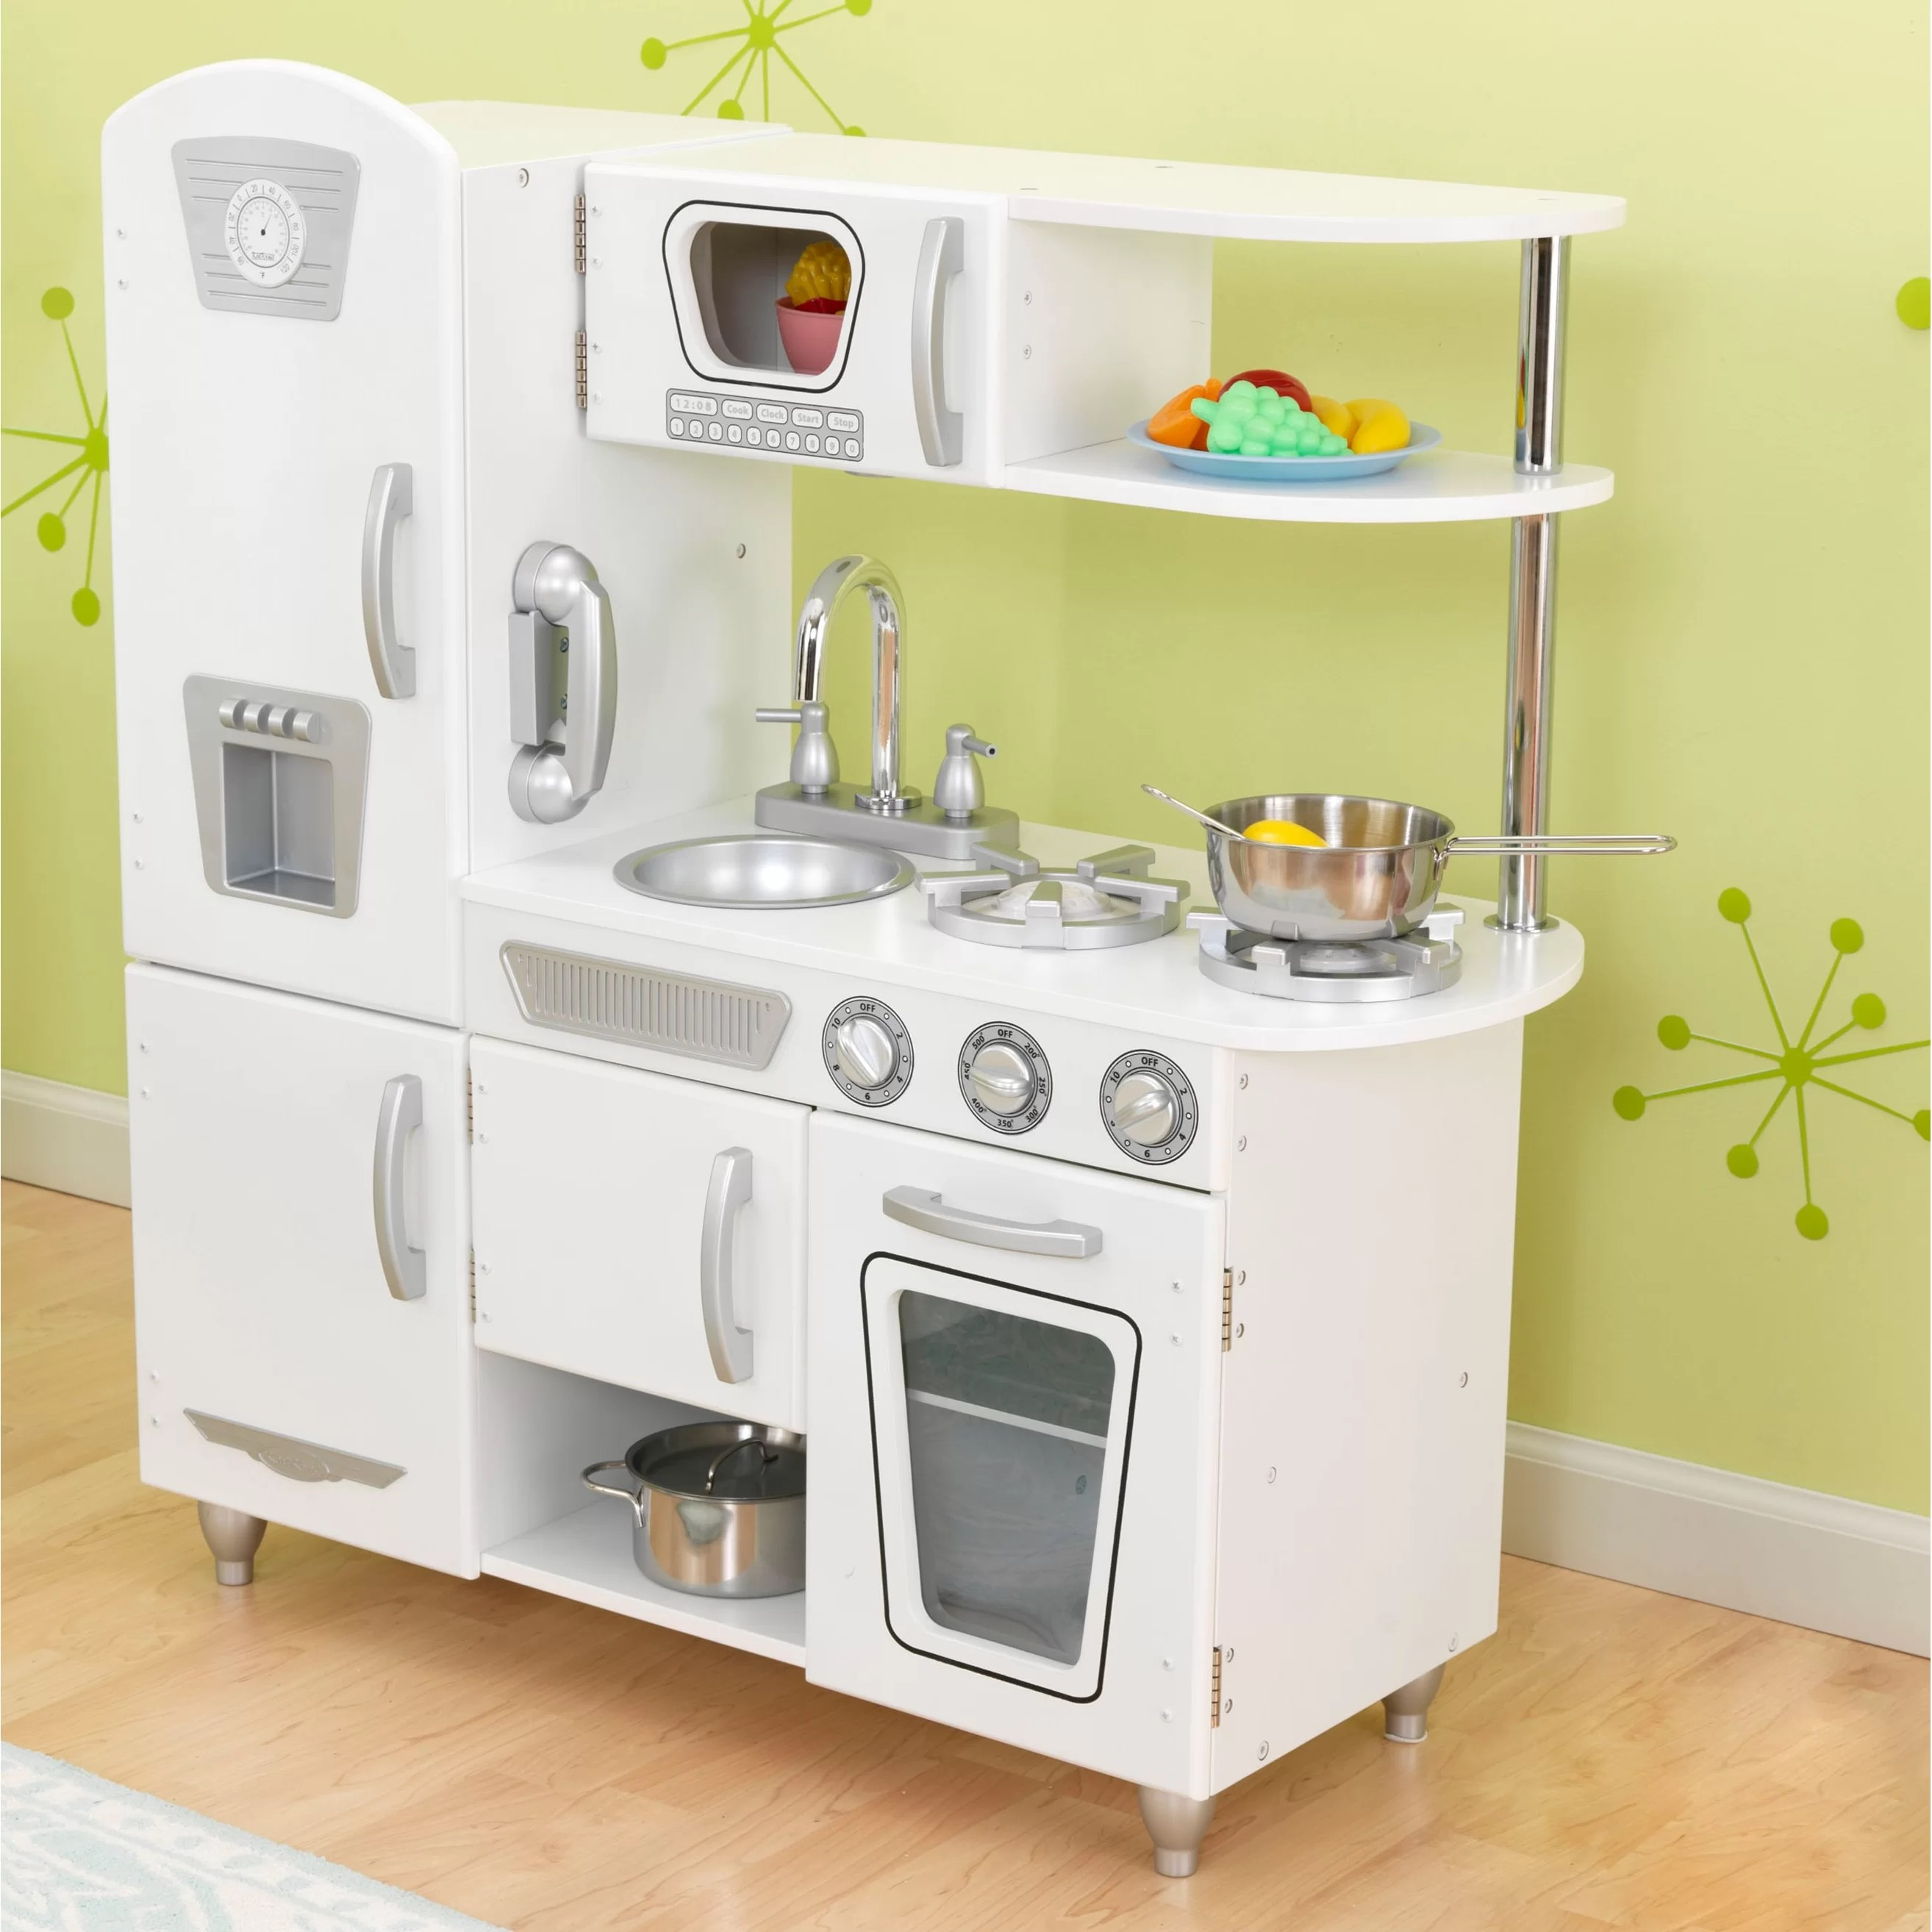 children play kitchen inexpensive backsplash kidkraft vintage and reviews wayfair